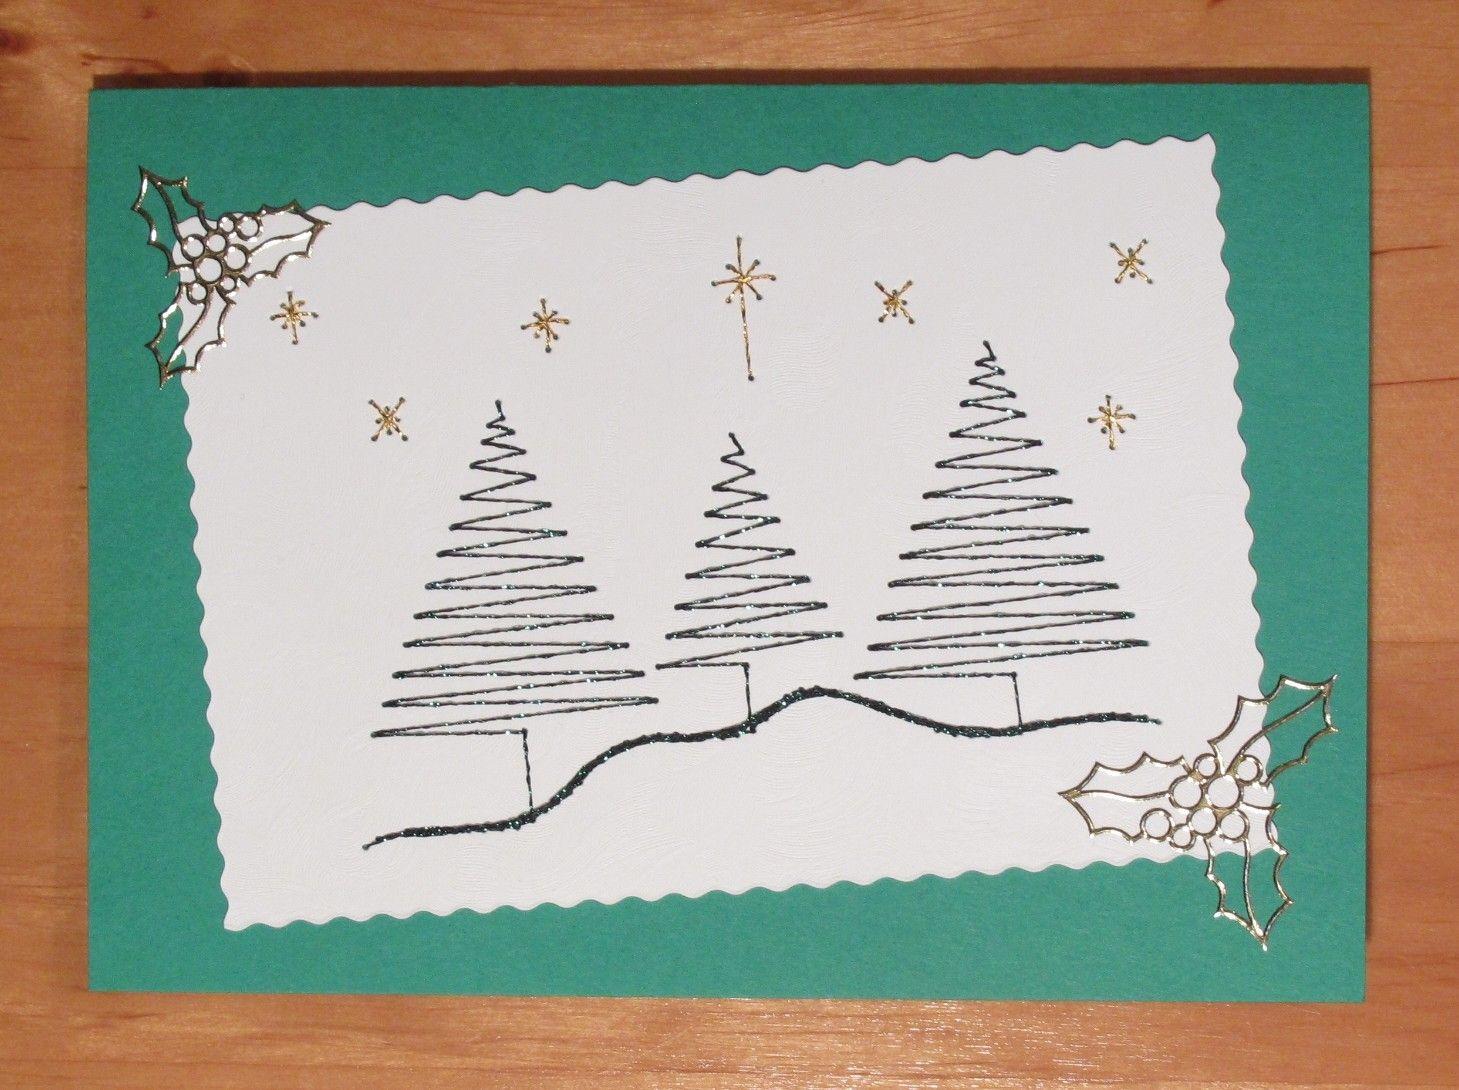 16x Neutrale Kerstdecoraties : Pin van anna pilarska op my stiching cards pinterest stichting